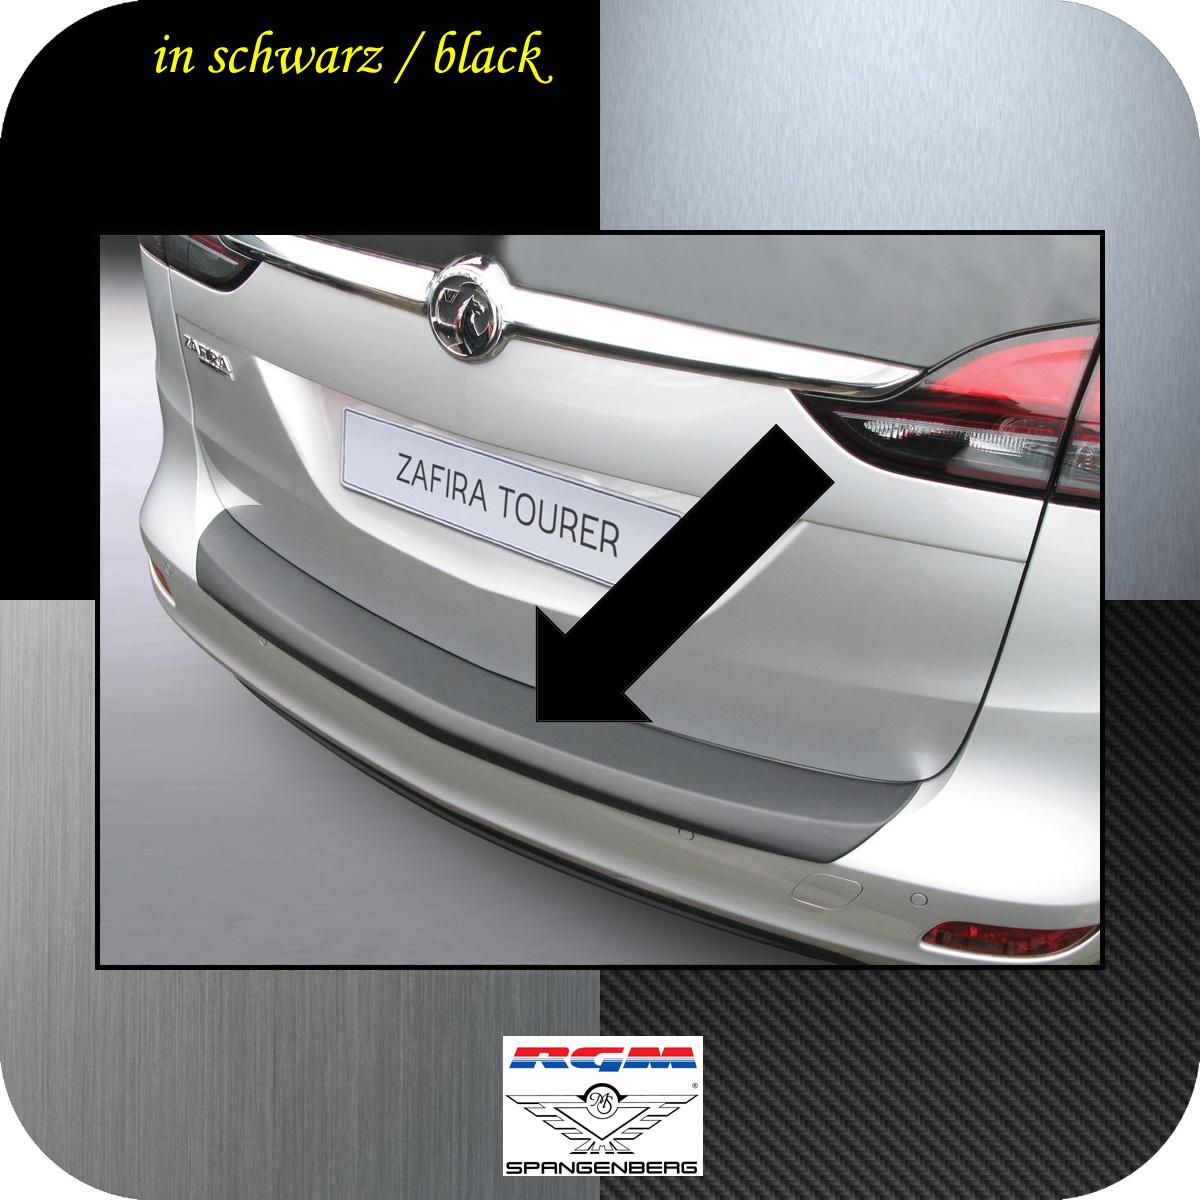 Passgenaue Kofferraummatte Stoßstangenschutz für Opel Zafira Tourer ab 2012